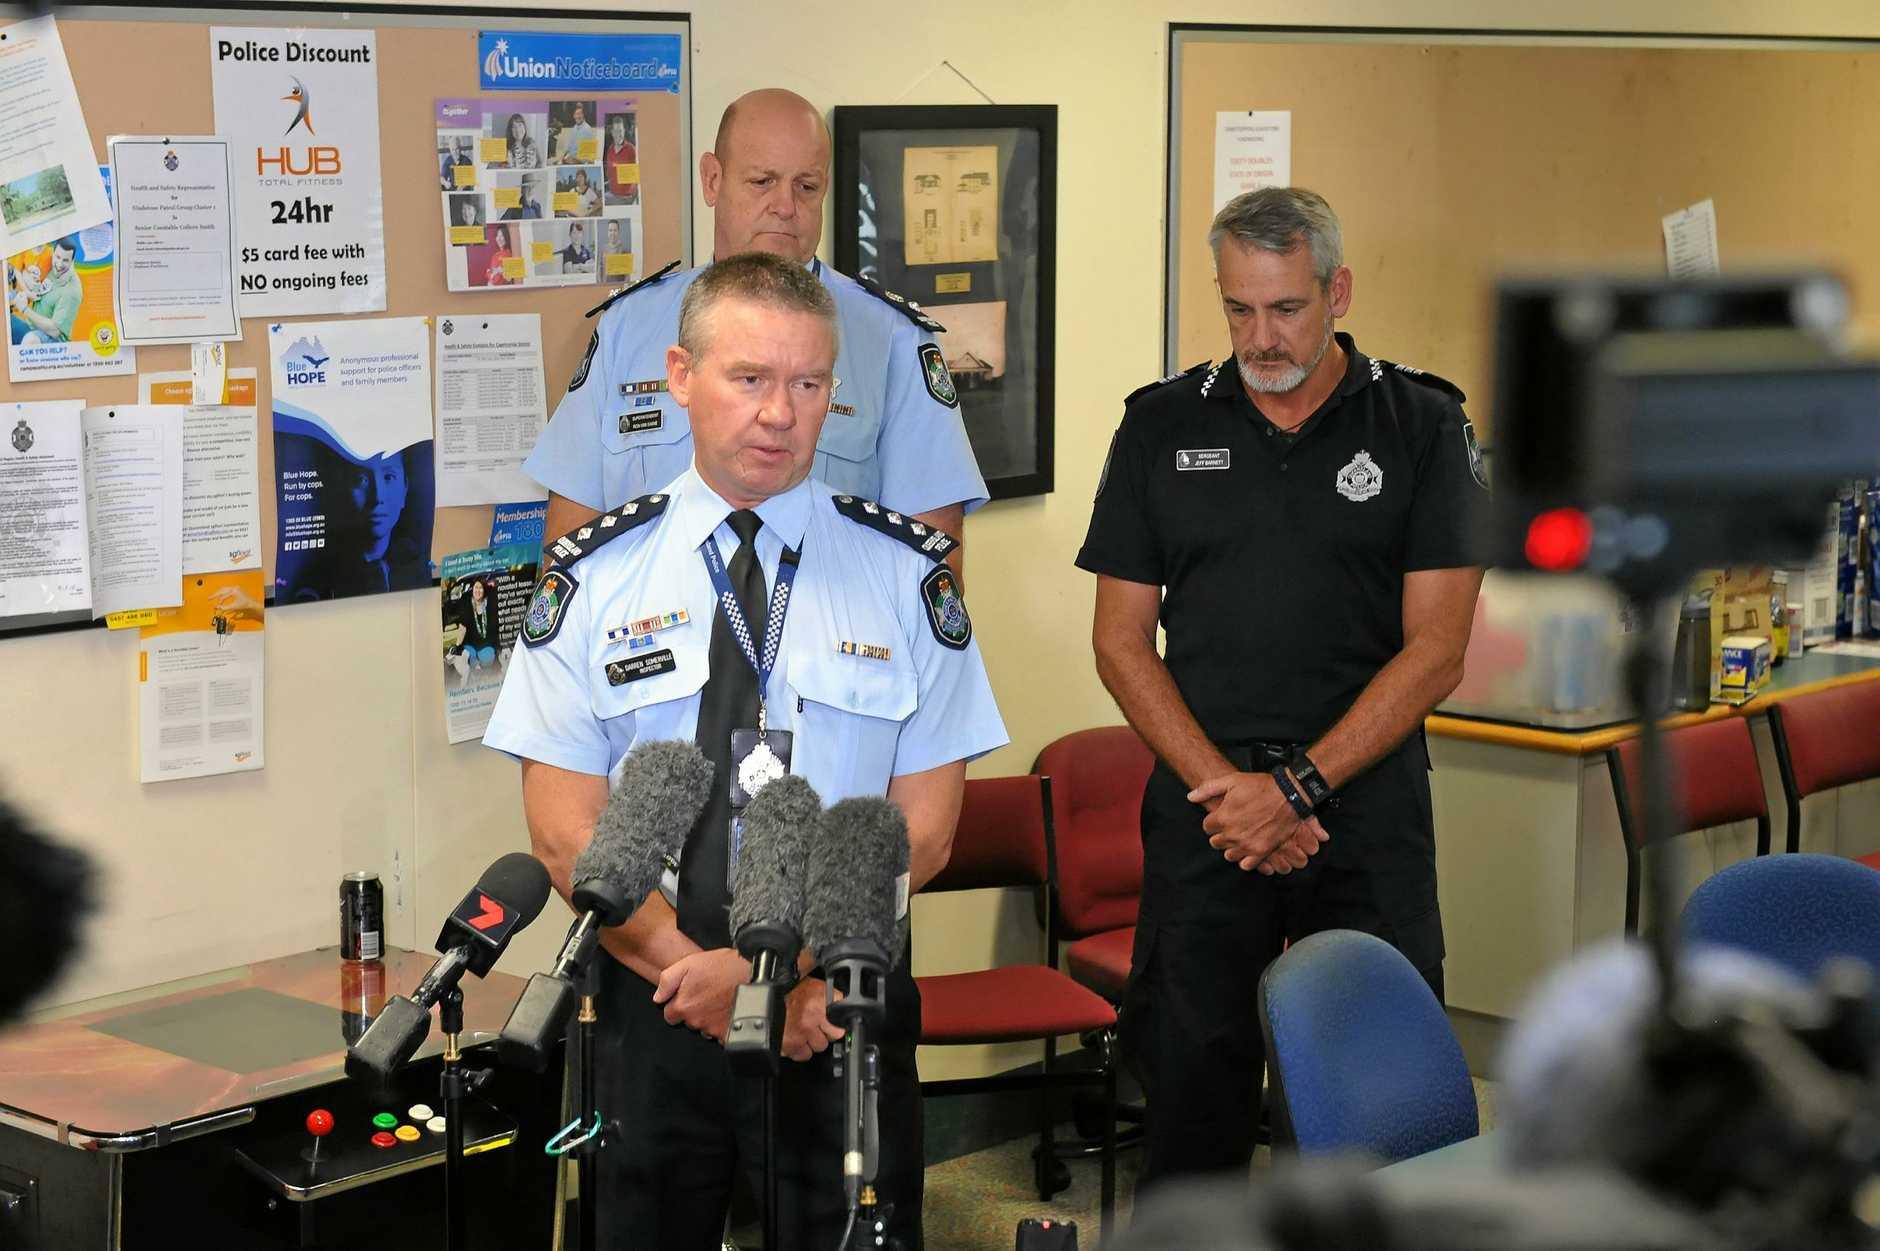 Inspector Darren Somerville, Superintendent Ron Van Saane and Sergeant Jeff Barnett.Media update for the missing fishing boat crew.